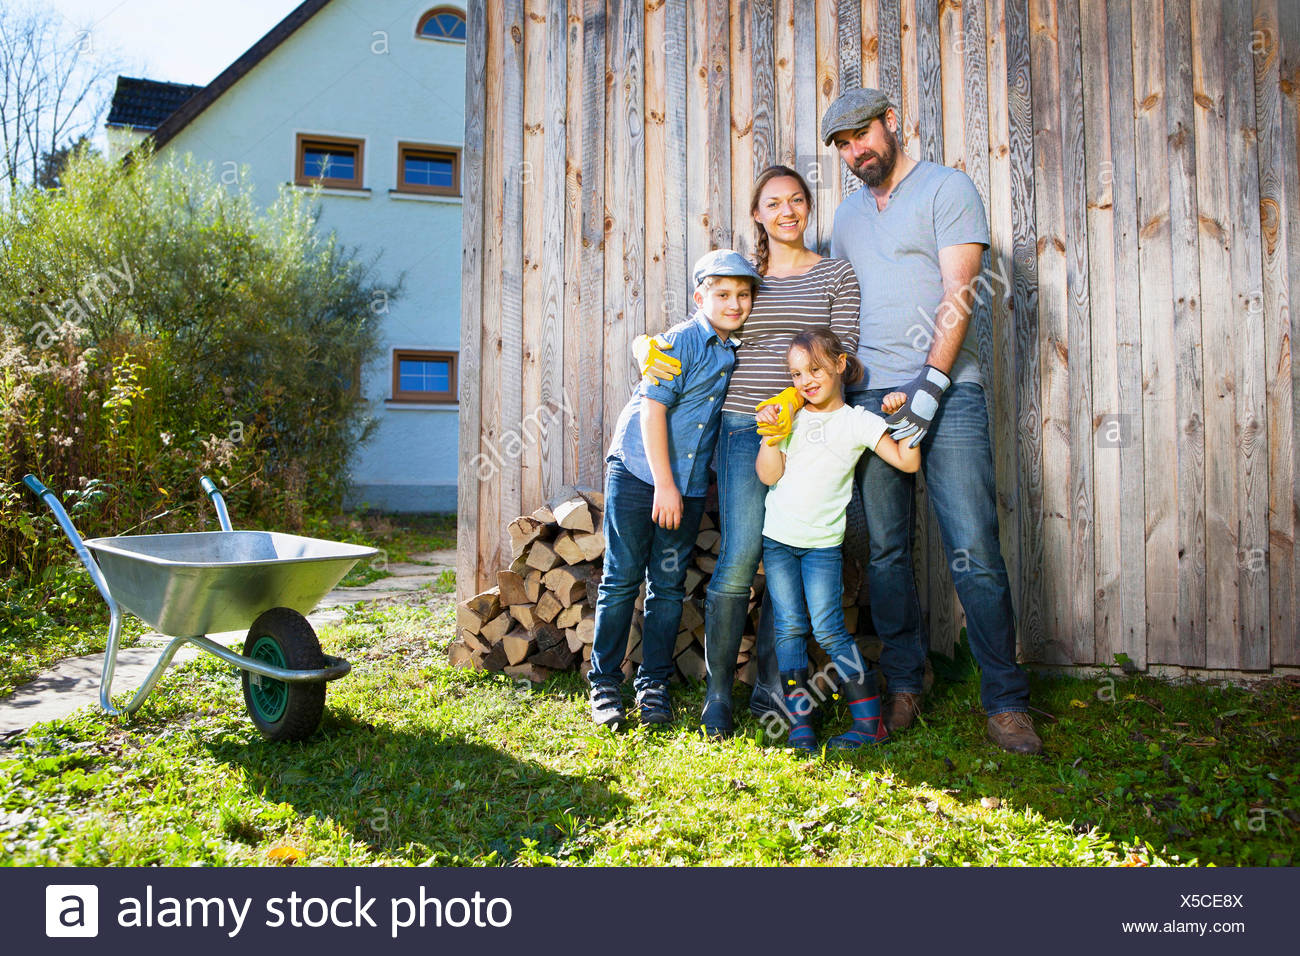 Family in garden with wheelbarrow, Munich, Bavaria, Germany - Stock Image